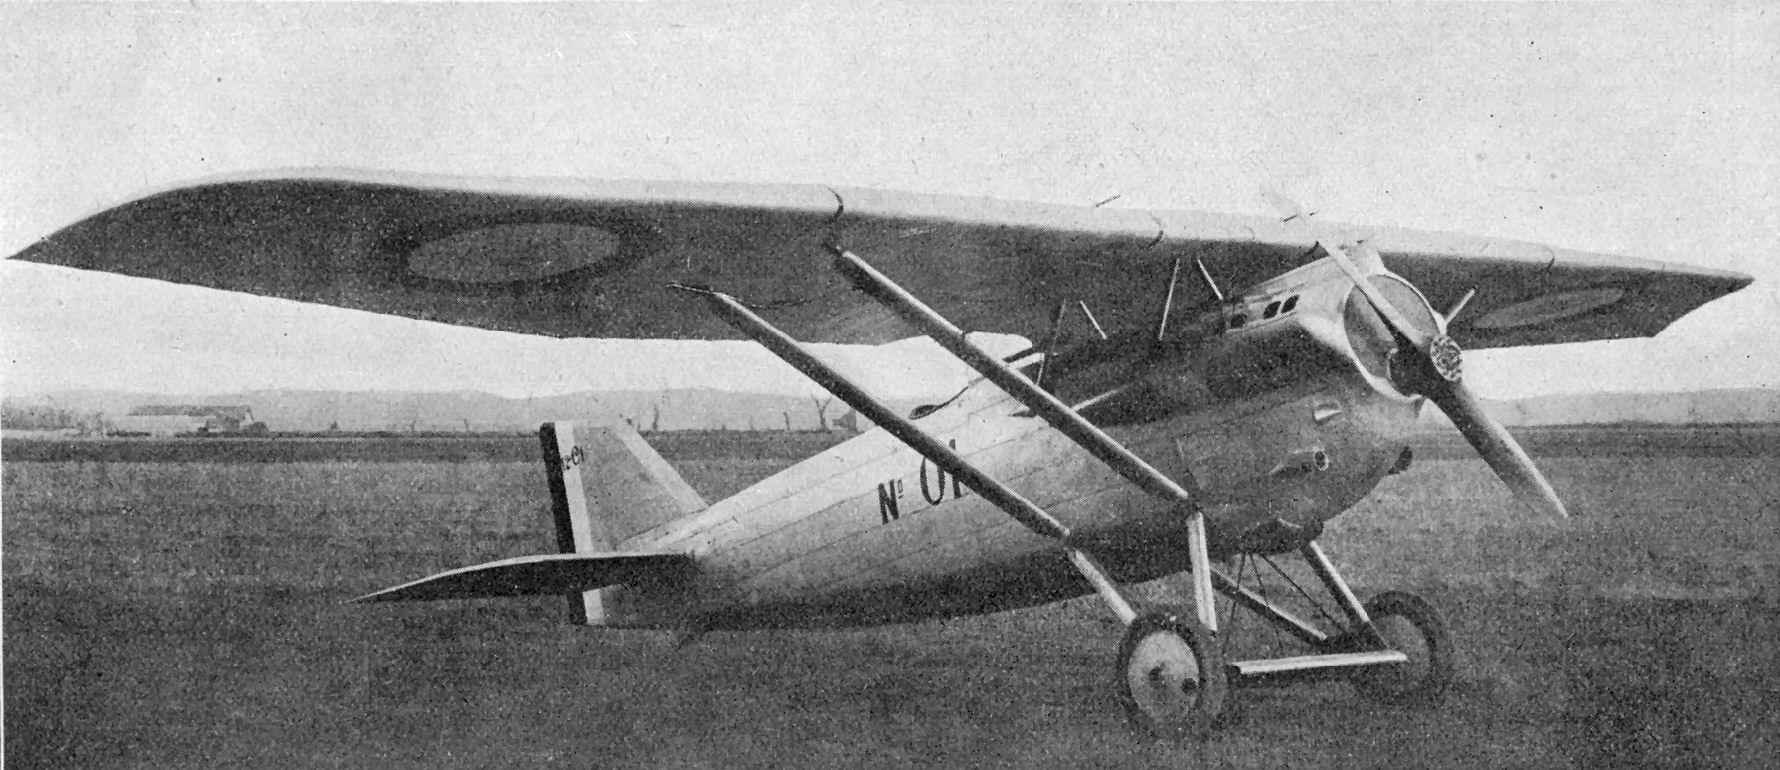 Transportation Company - Dewoitine - Aircraft Manufacturer